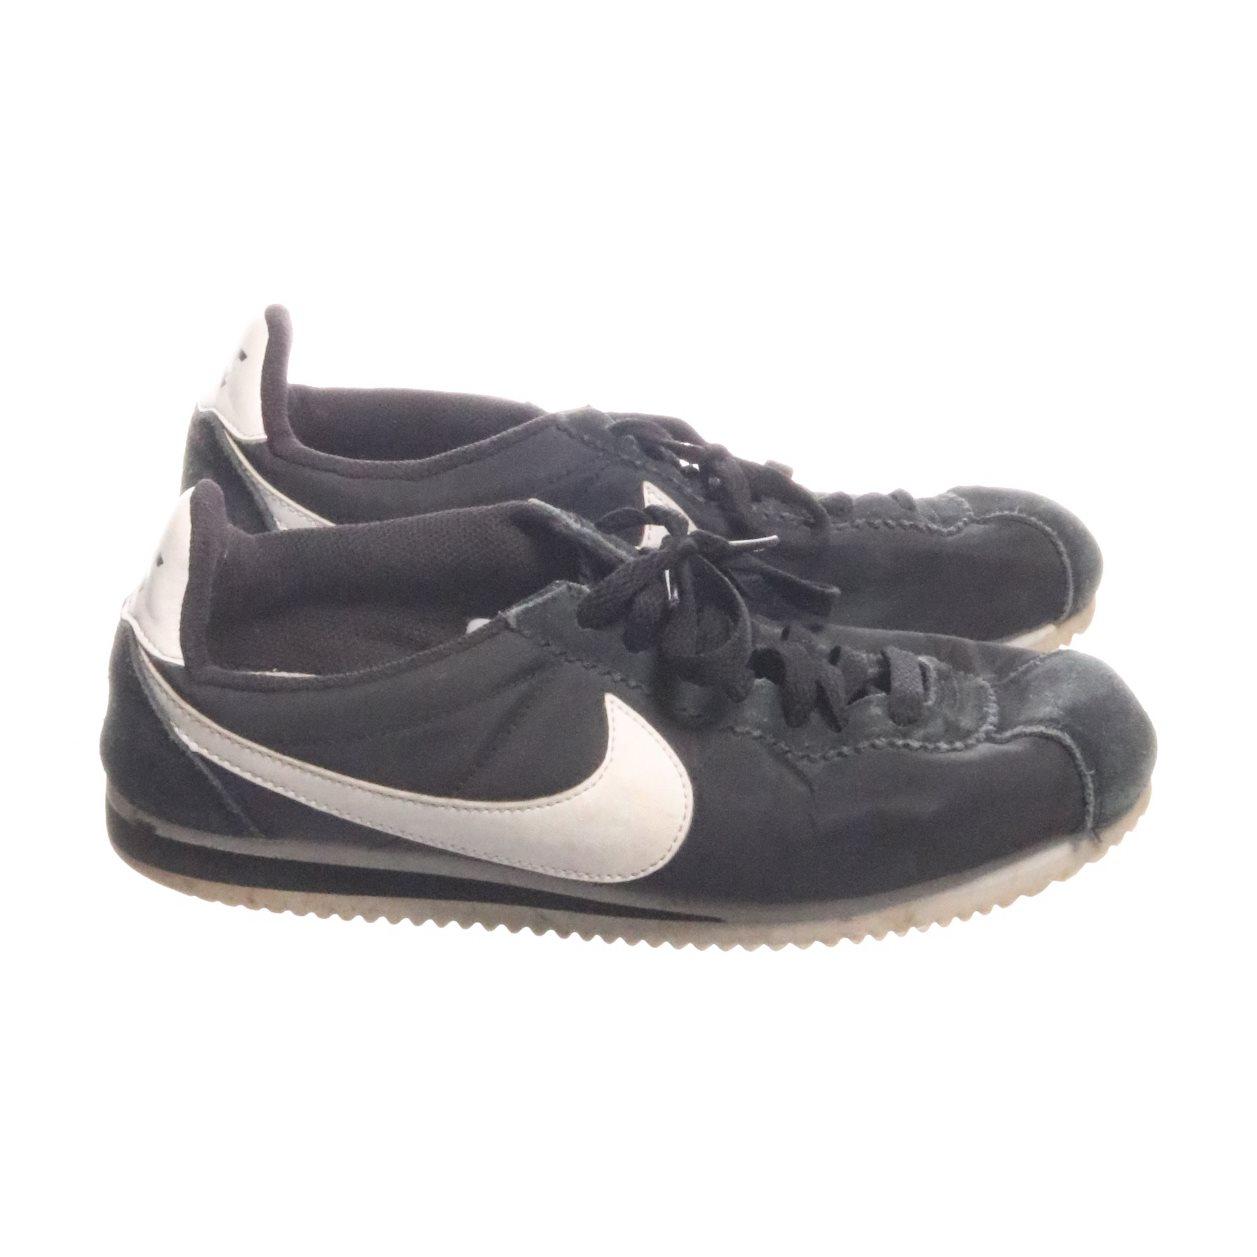 super popular ac36d 54995 ... brun 876873 002 sko  nike sneakers strl 39 classic cortez nylon svart  vit